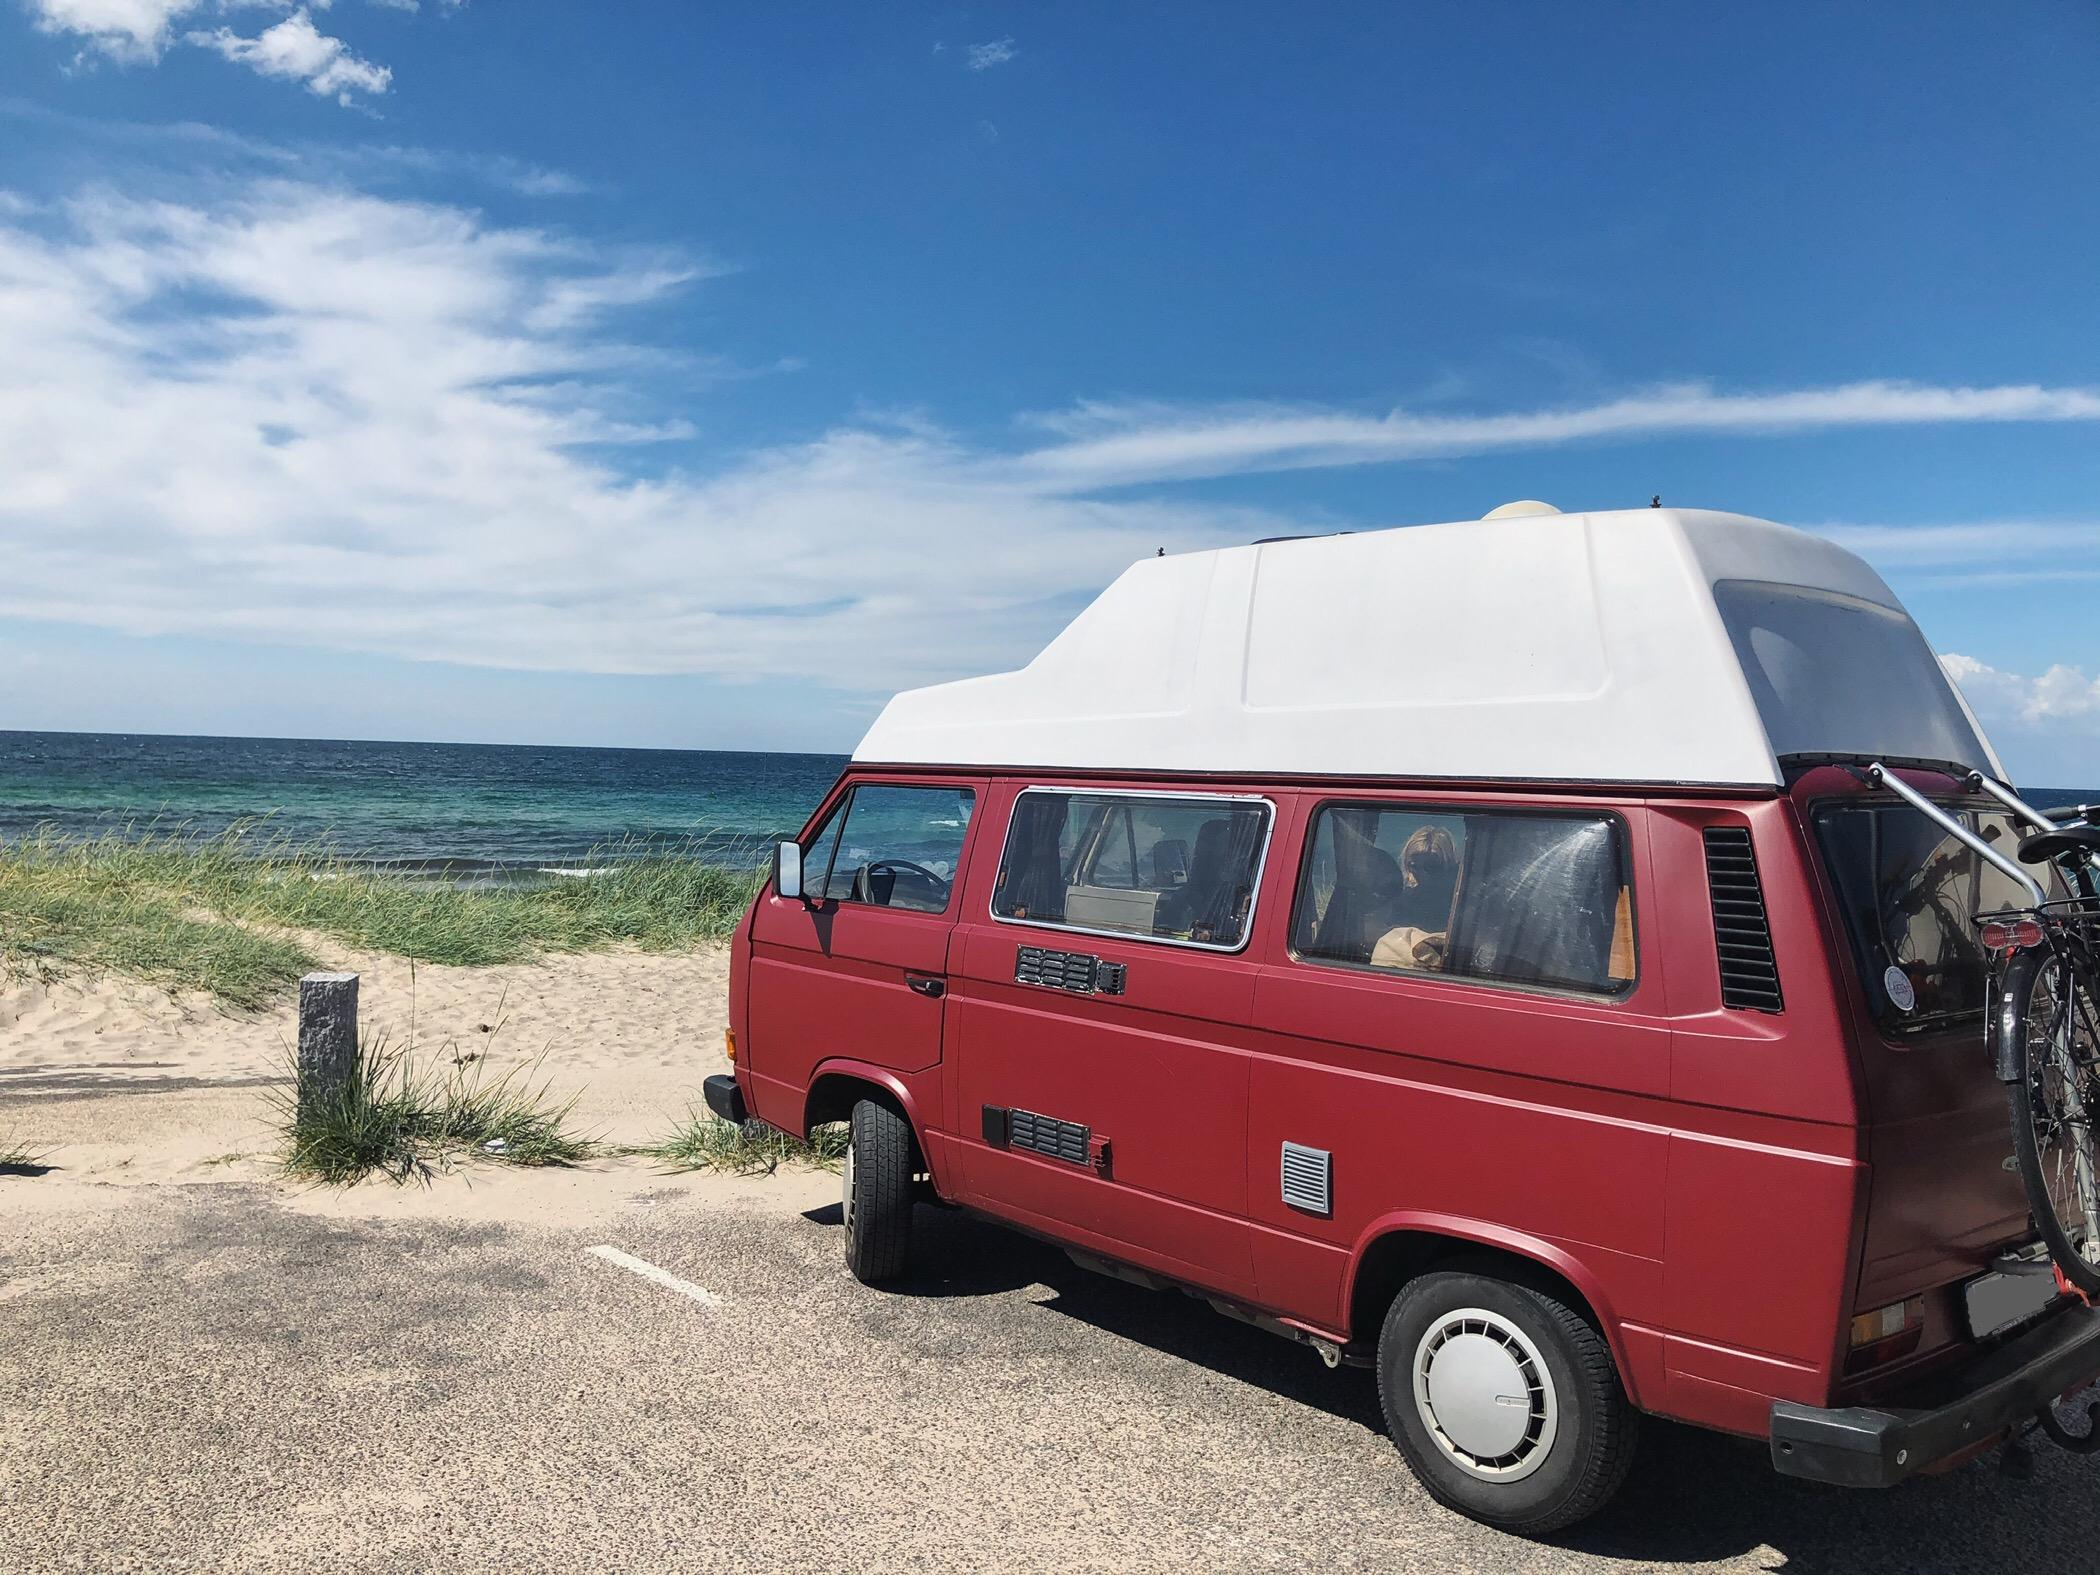 VW Bus T3 Helmut Reimo Hochdach rot Camper Bulli mieten Rostock bincampen campen direkt am Meer Dänemark erste Reihe Sommer Sonne Strand